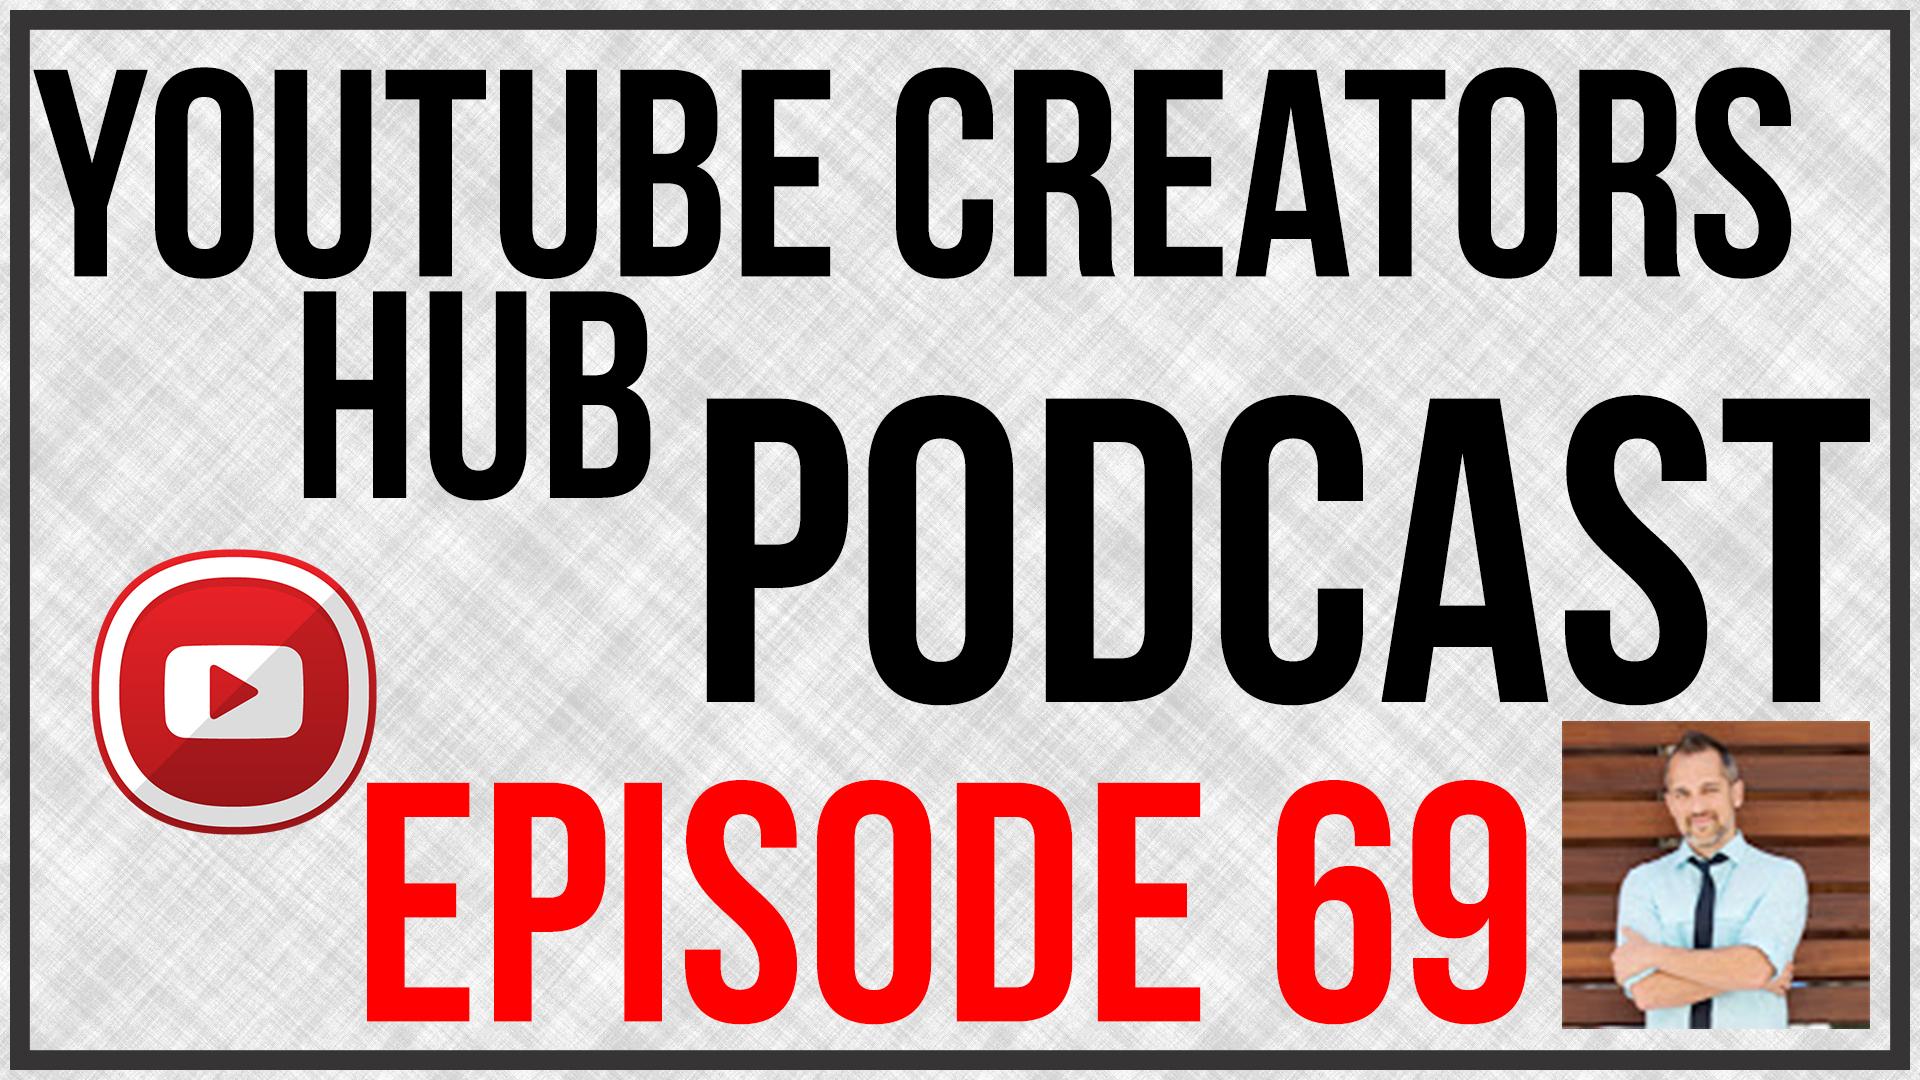 YouTube Creators Hub Podcast Episode 69